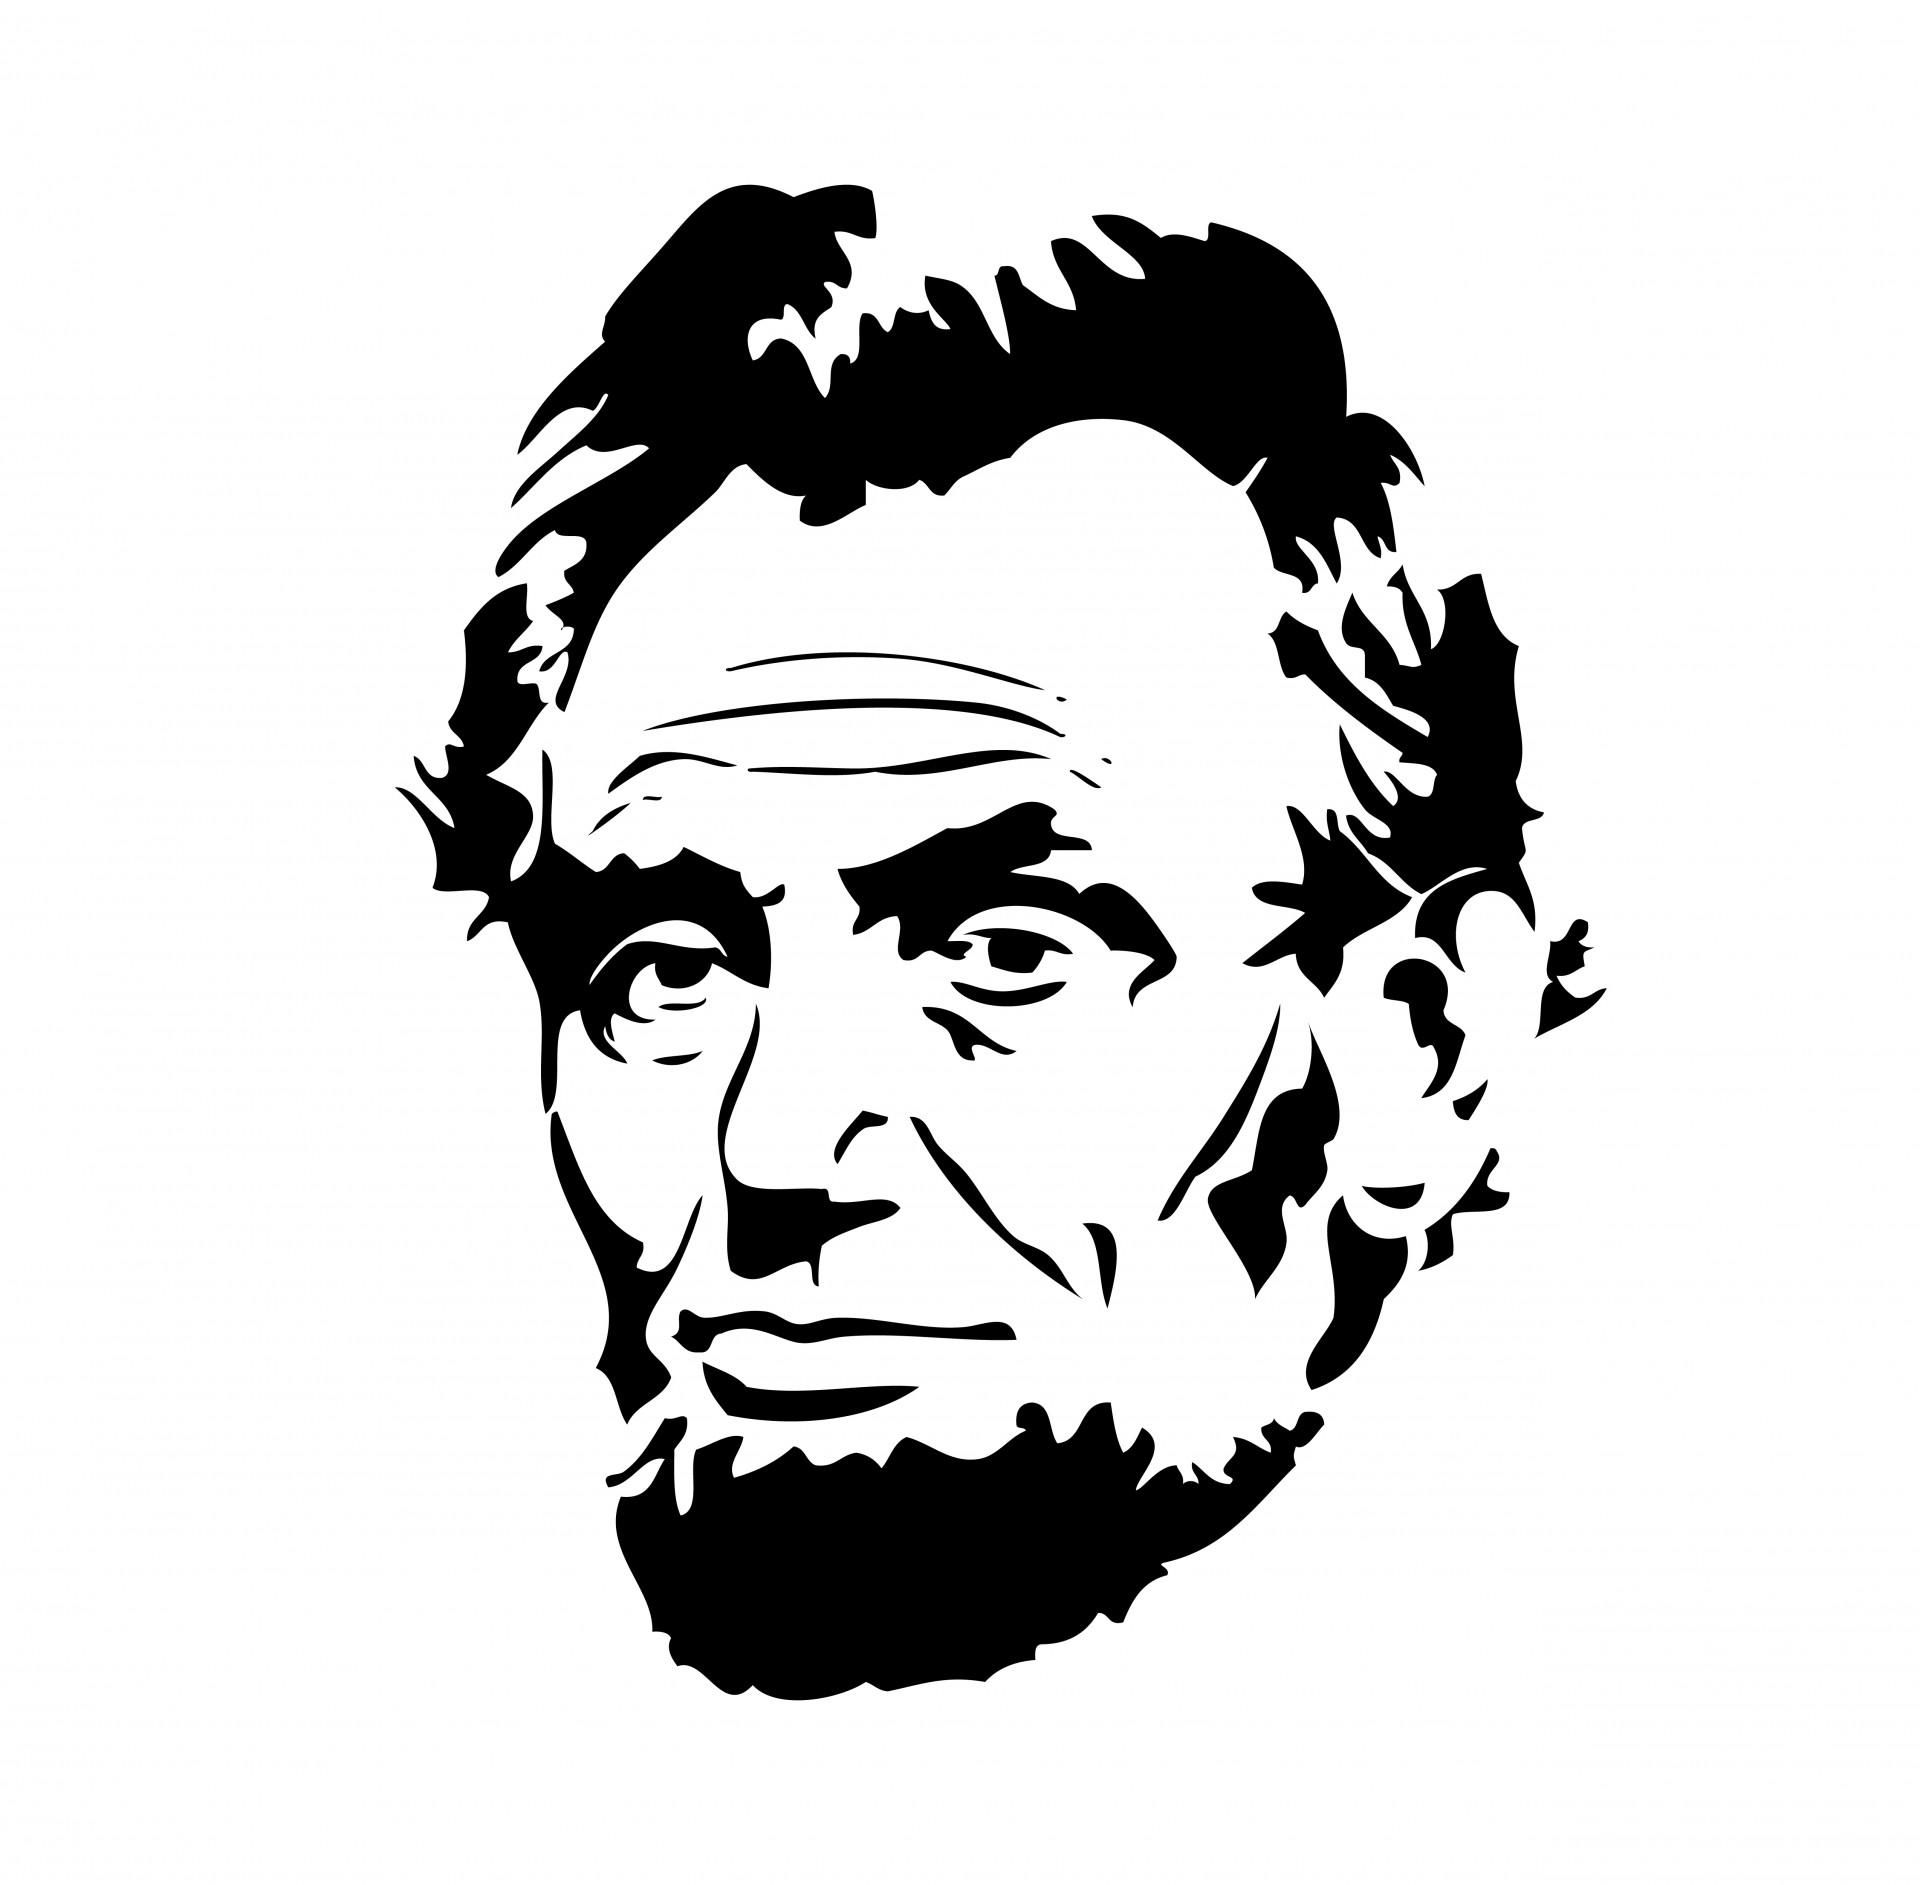 Abraham Lincoln Clipart-Abraham Lincoln Clipart-9